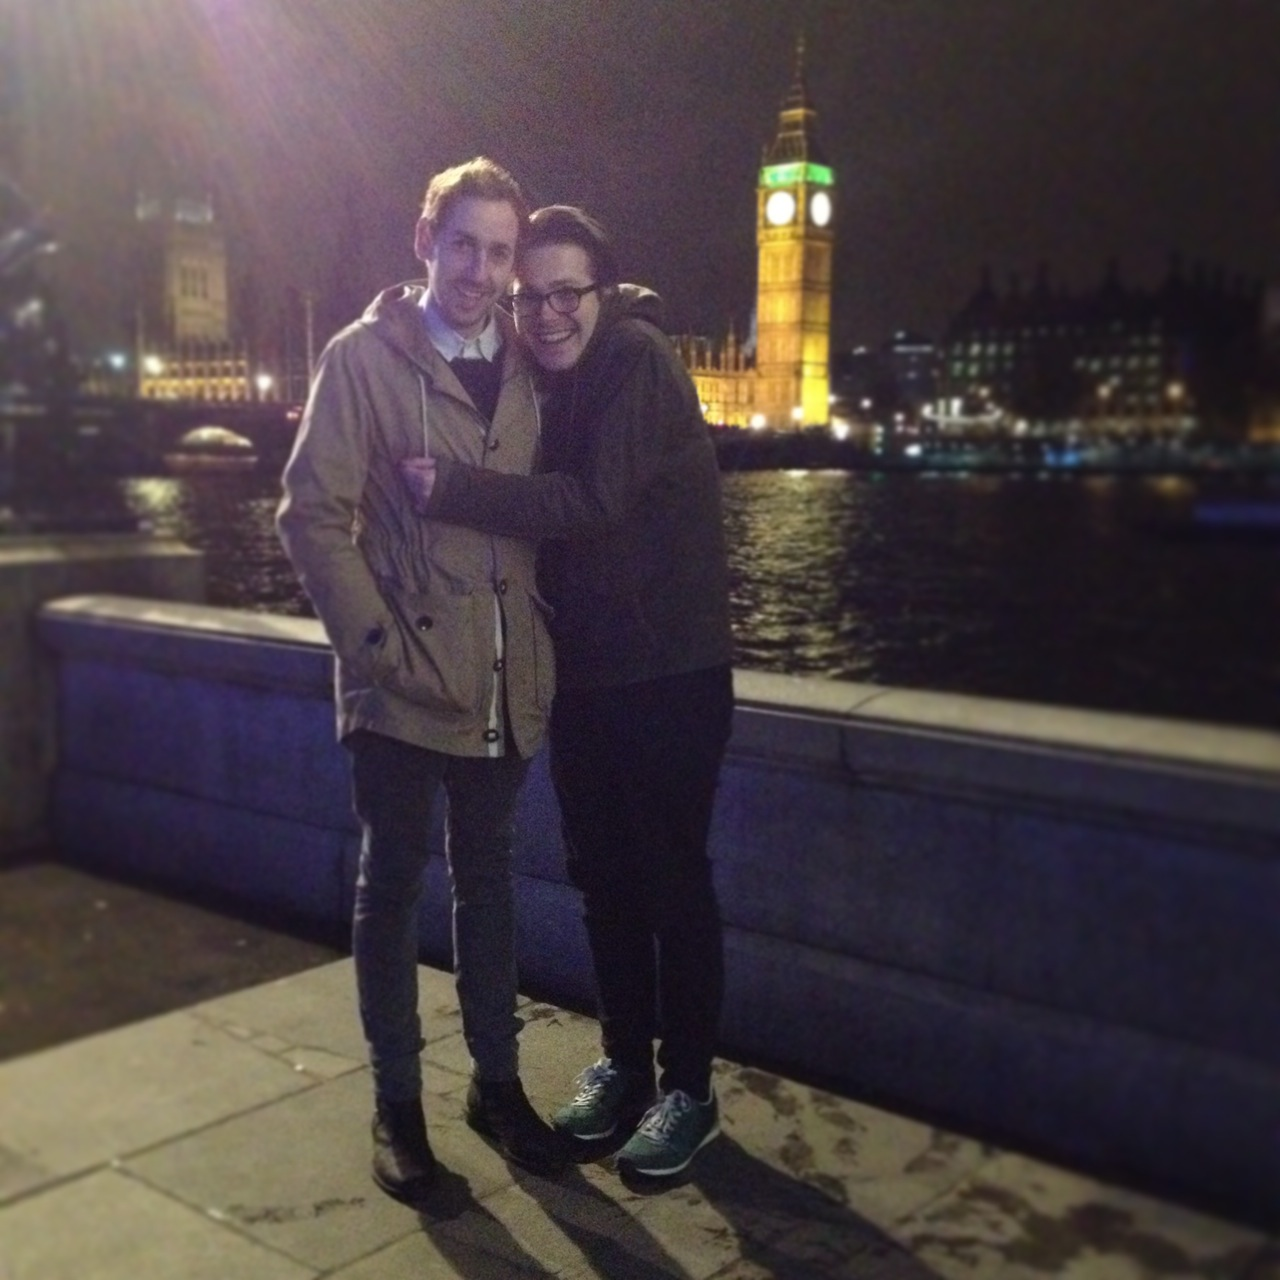 patrick hanlon russell james alford london view big ben